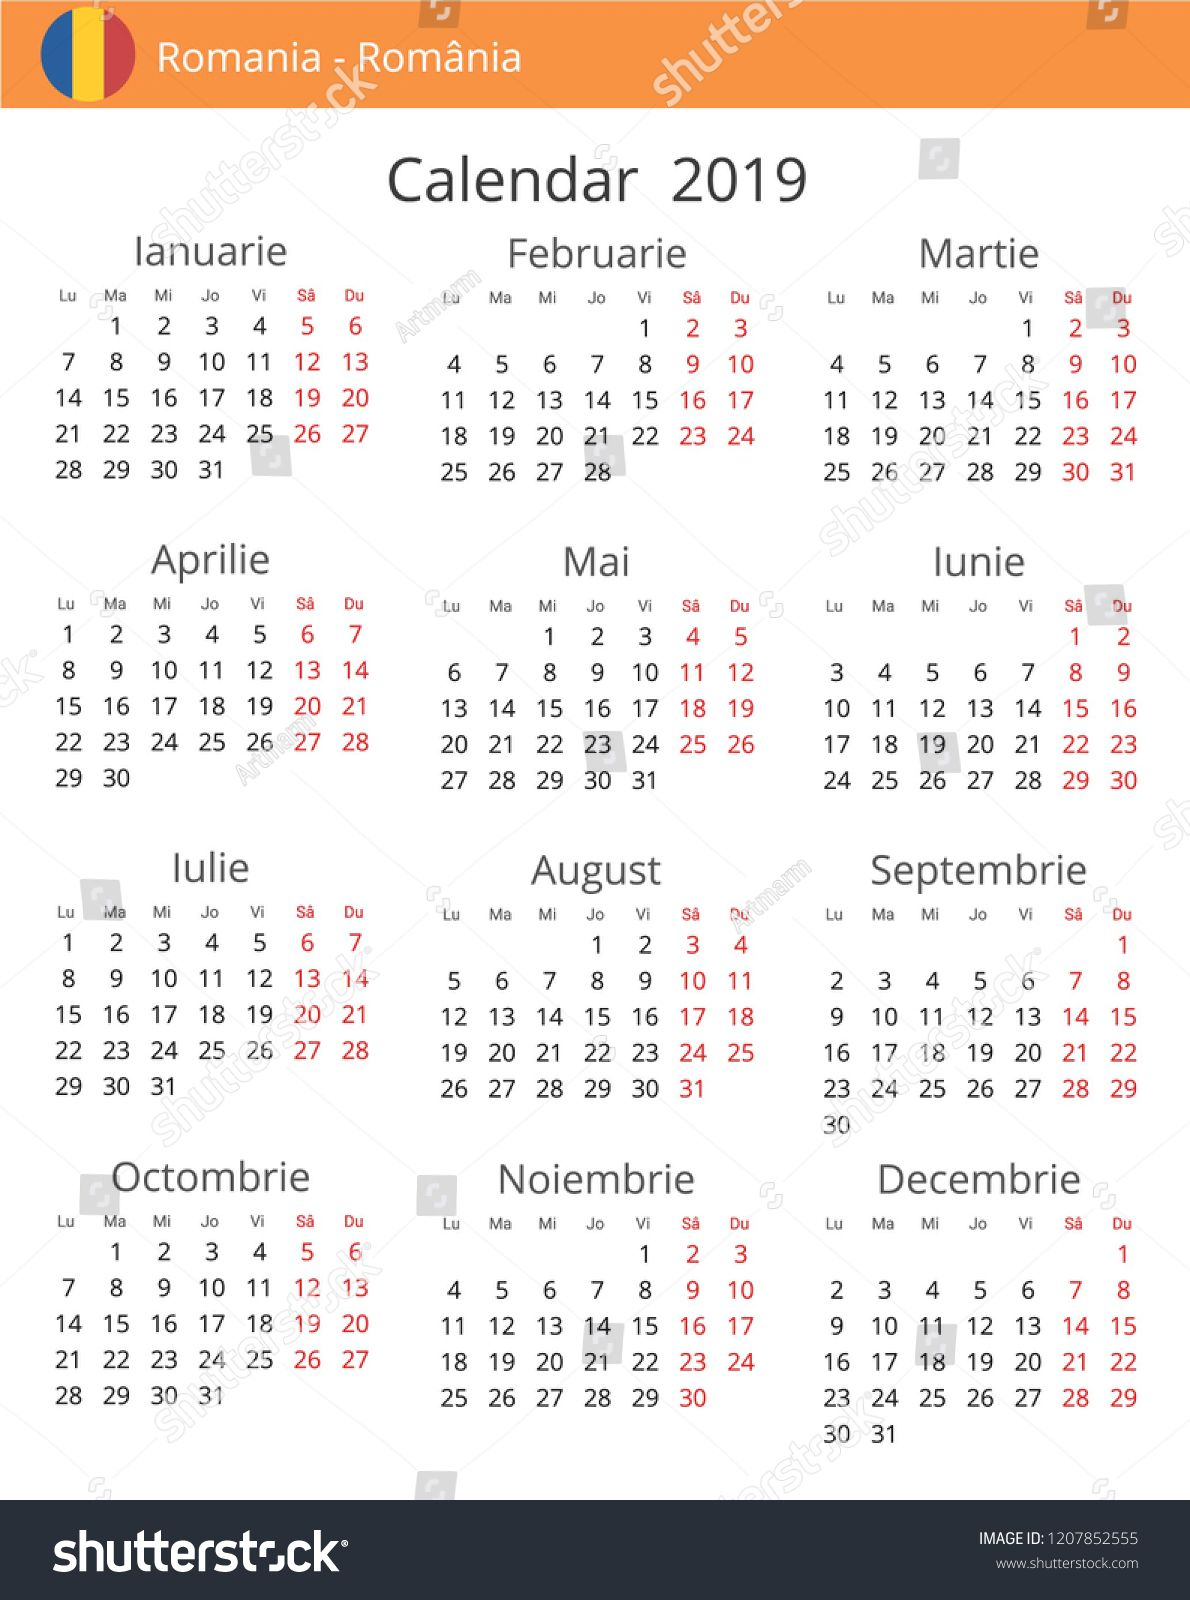 Calendar 2019 year for Romania country. Romanian language